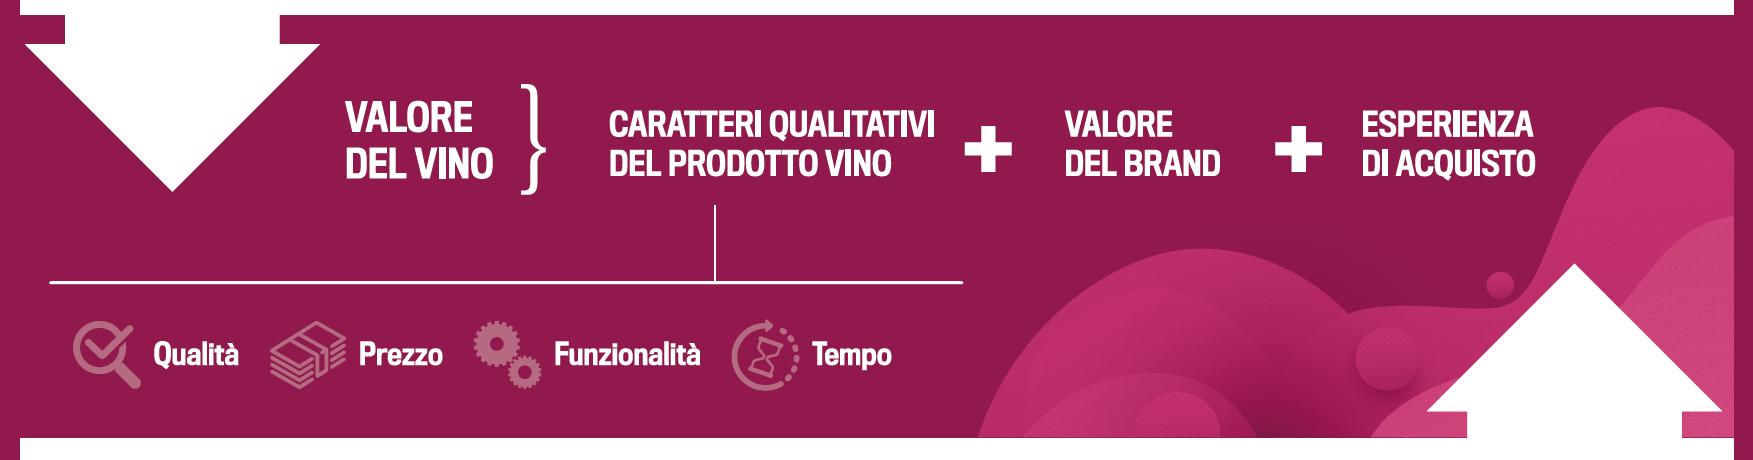 Mappa strategica impresa vitivinicola valore del vino